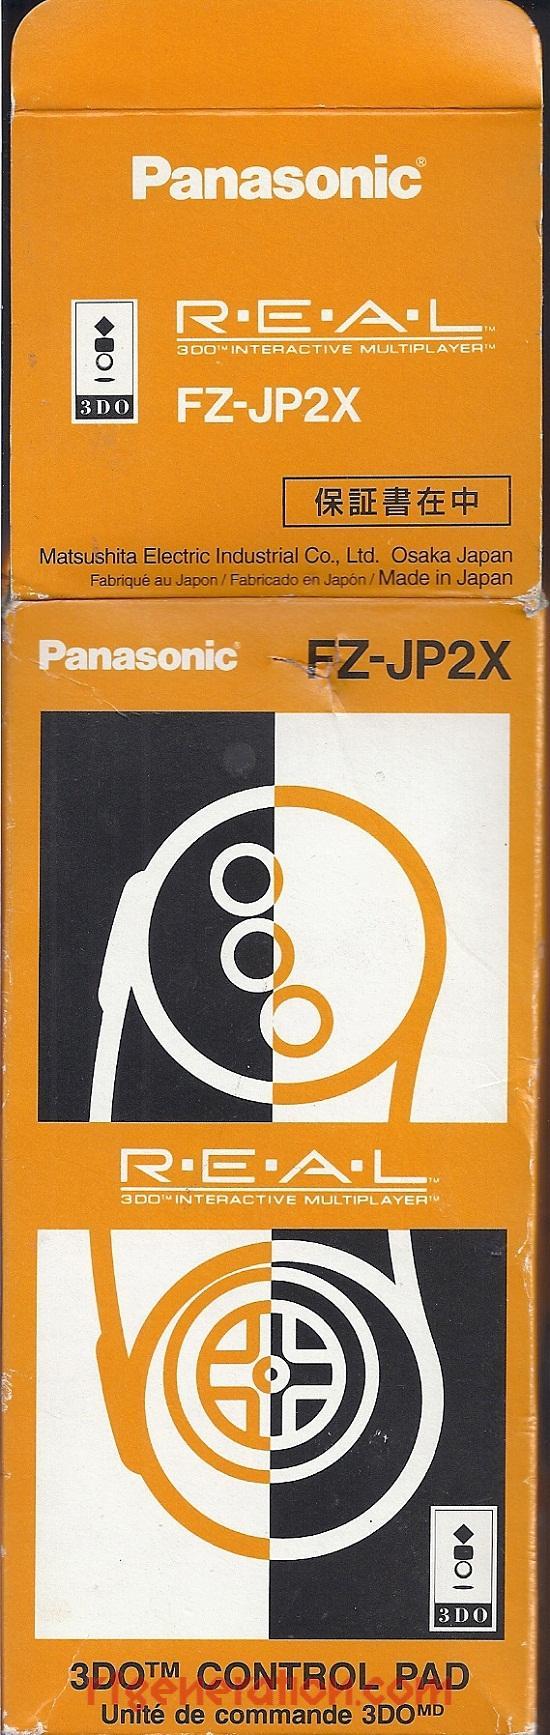 3DO Control Pad (FZ-JP2X)  Box Front Image